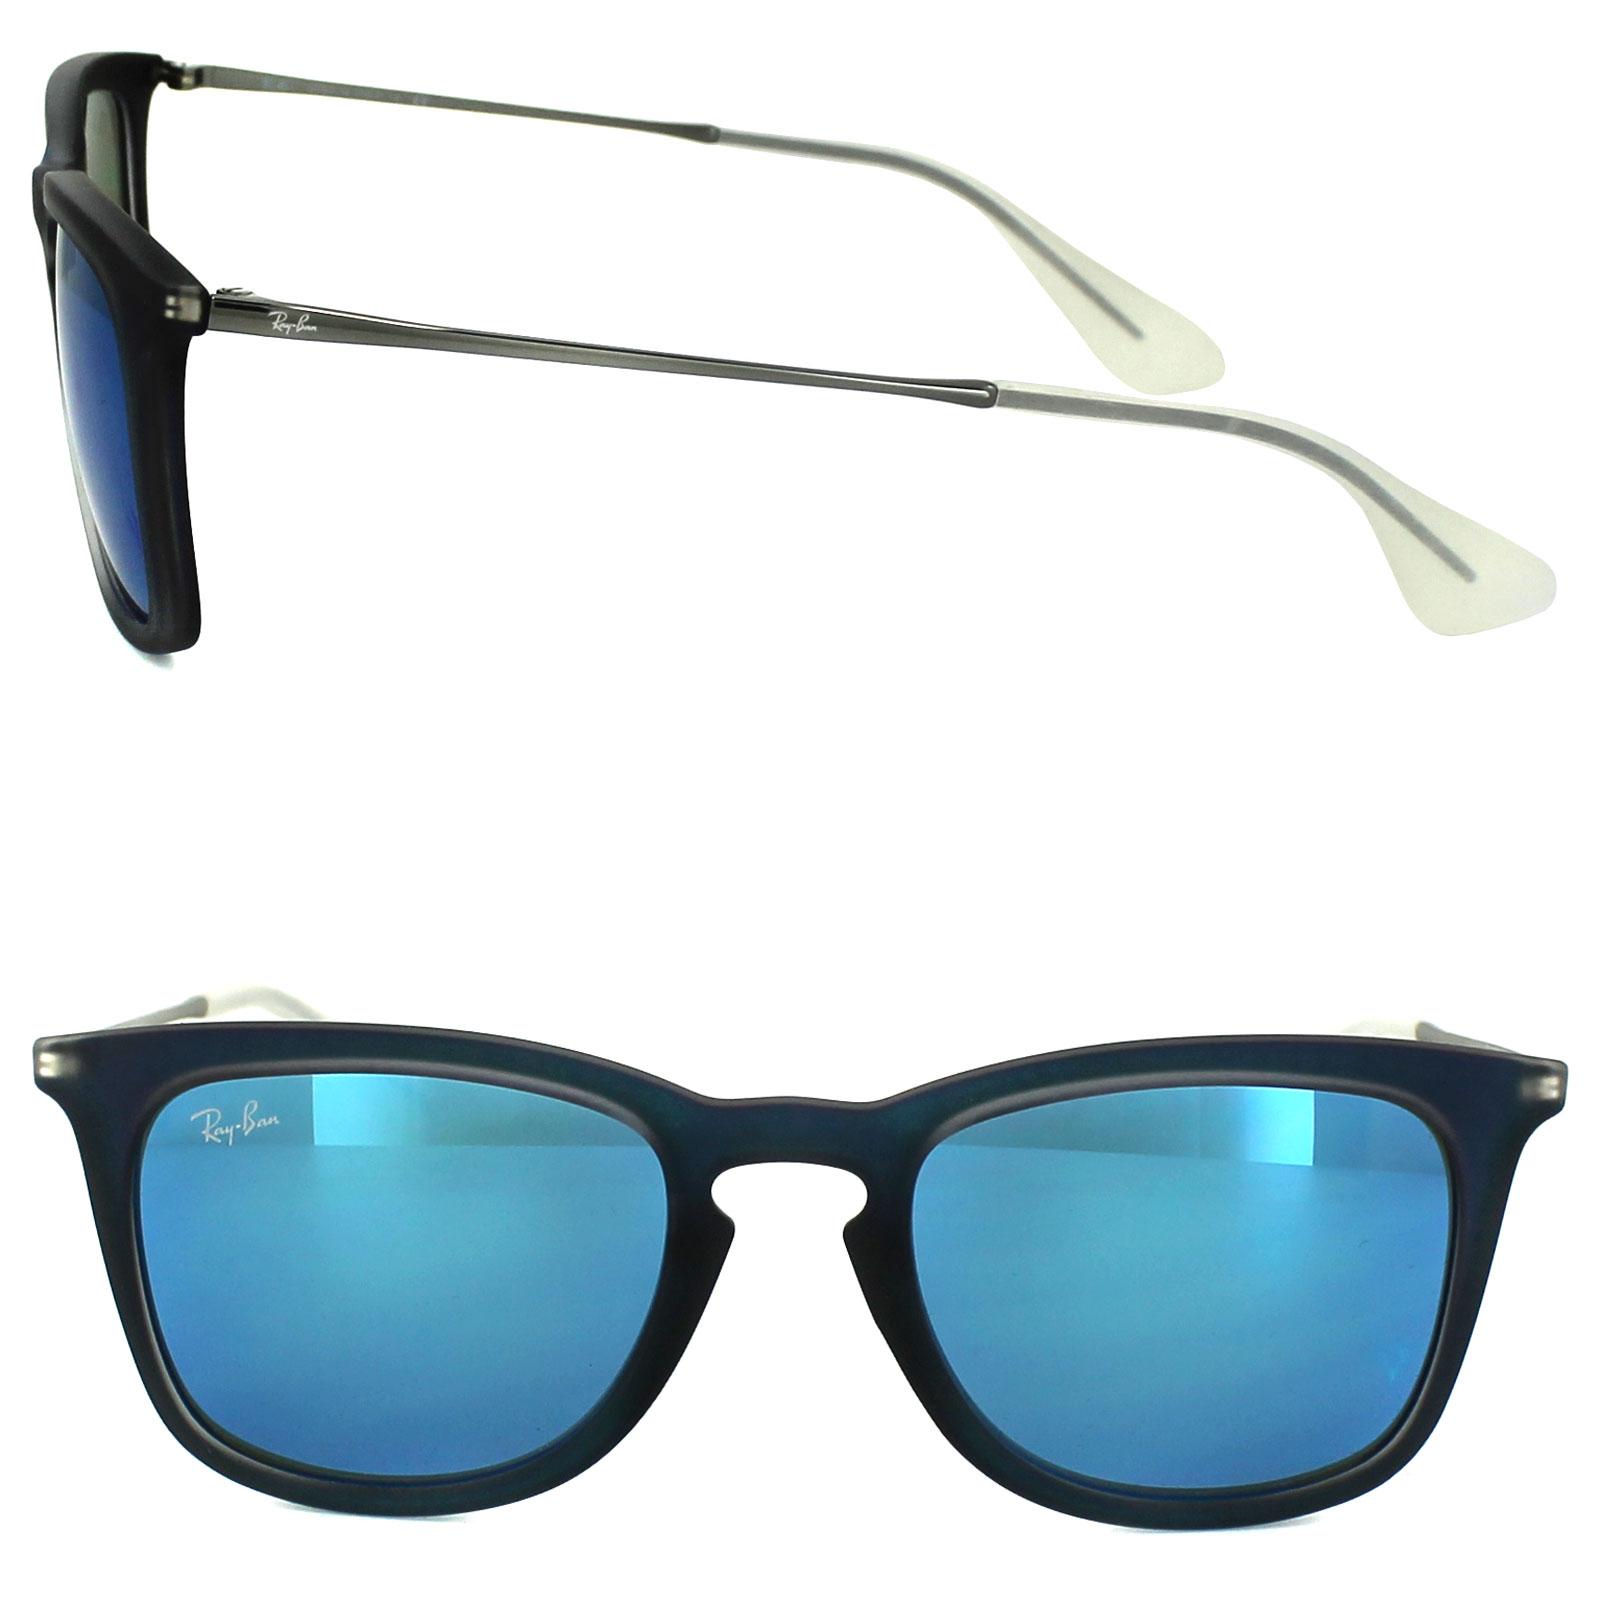 4125f28c79fa Blue Mirror Ray Bans Ebay « Heritage Malta